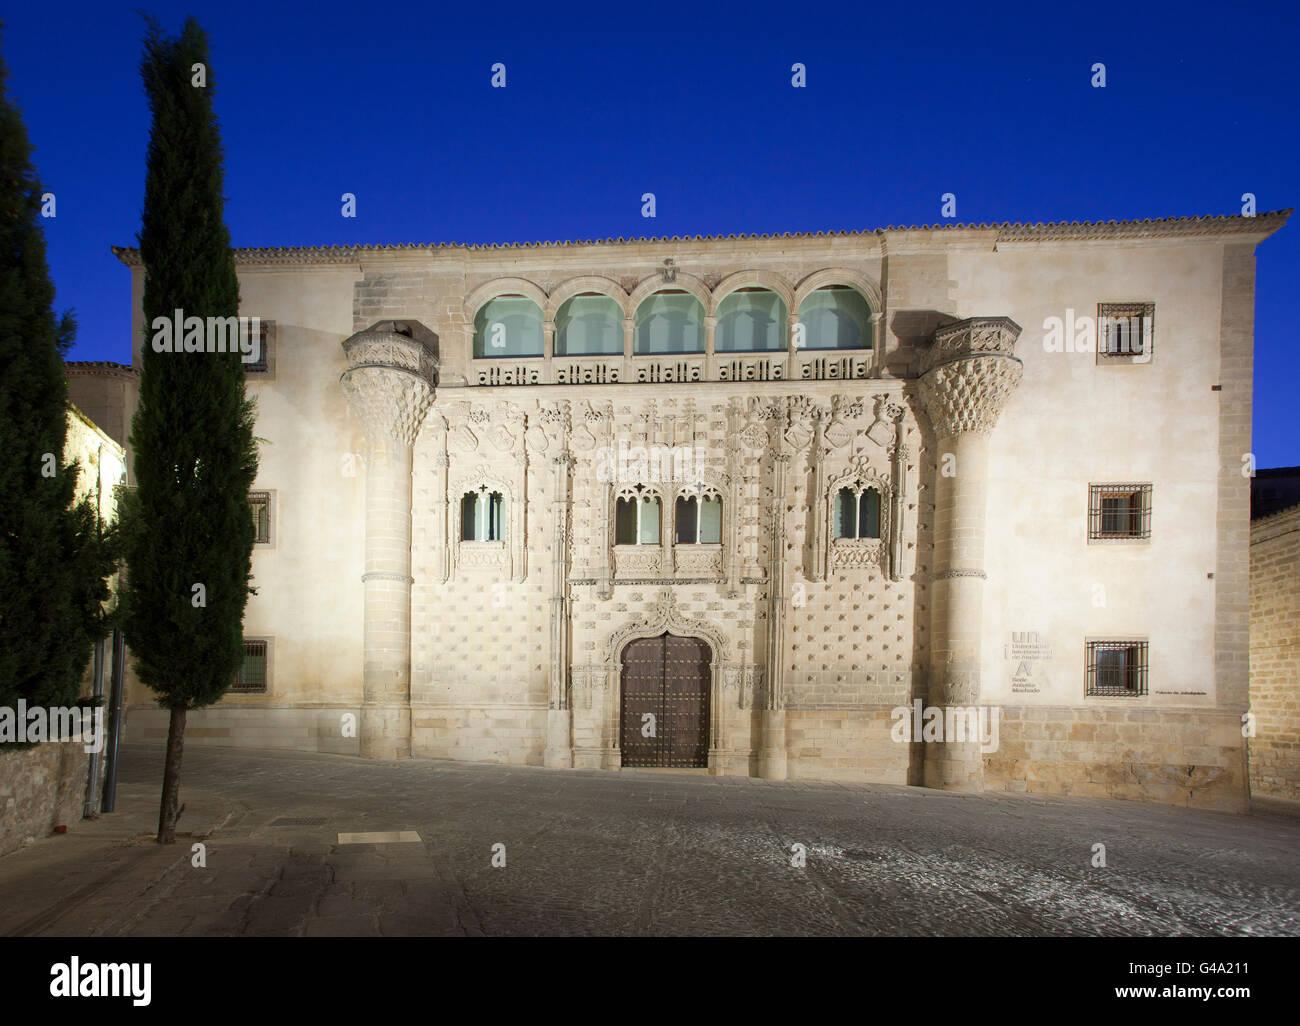 Universidad Internacional de Andalucía, Baeza, Andalusia, Spain, Europe - Stock Image